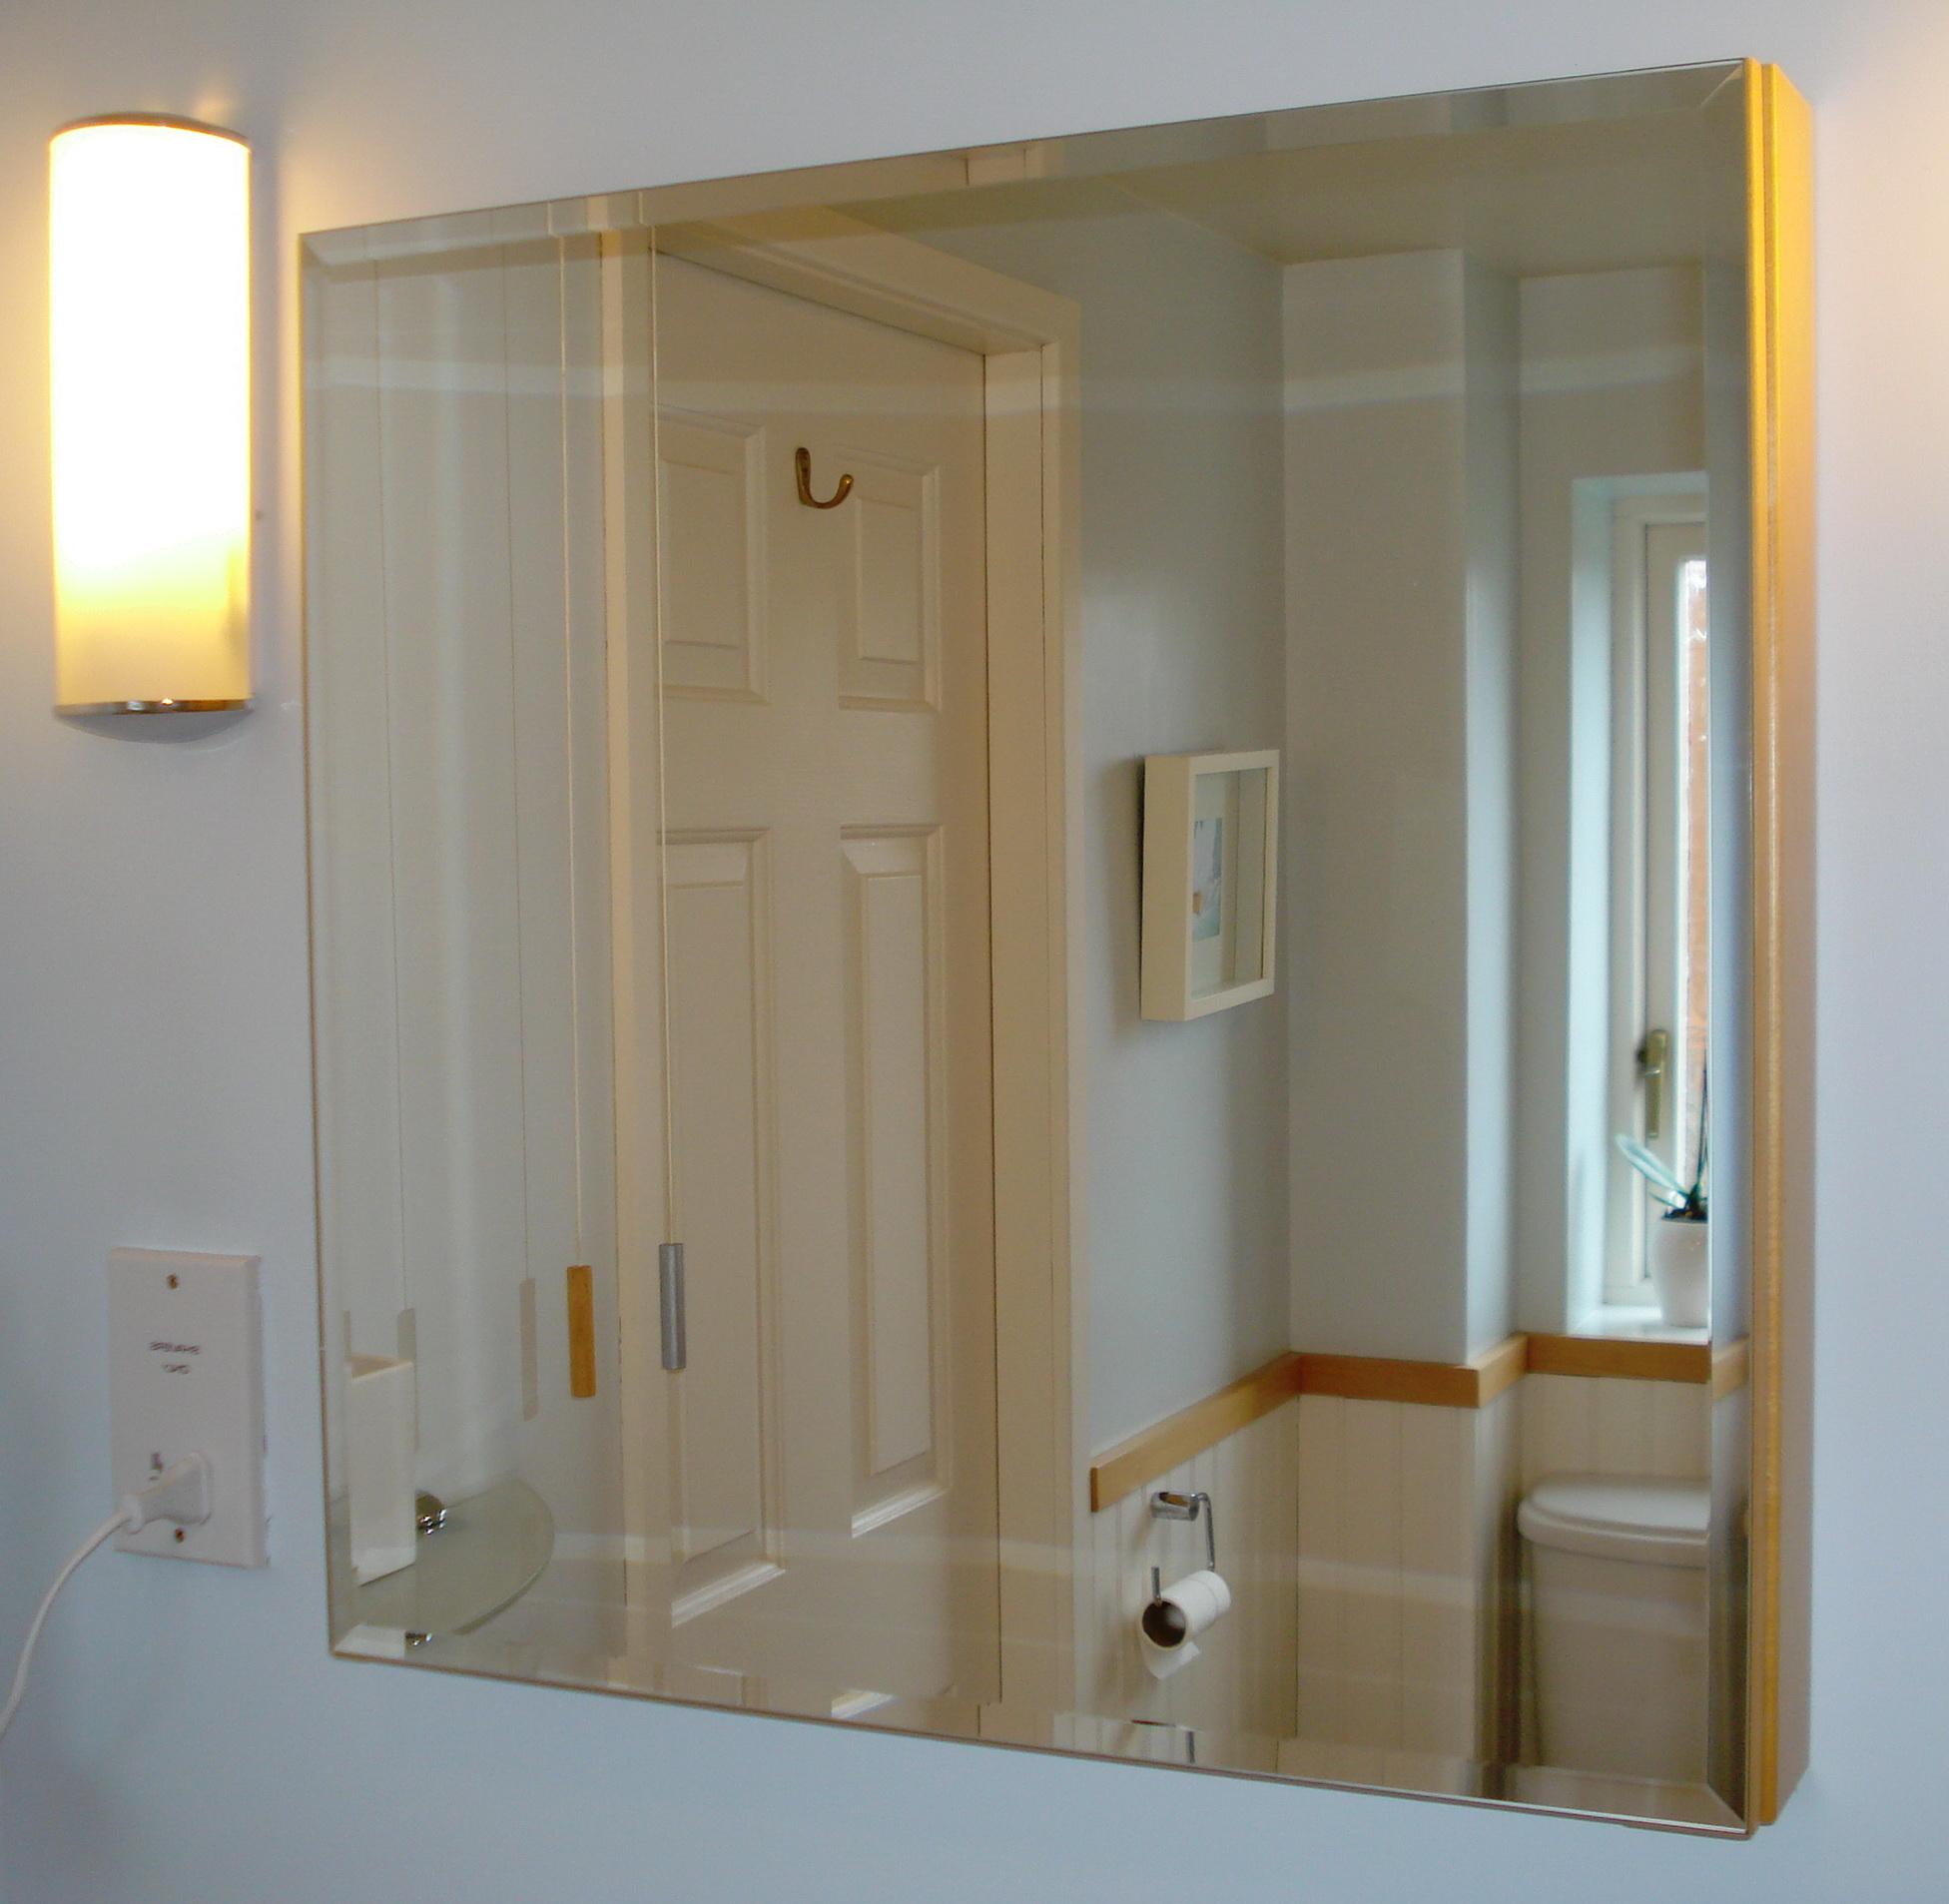 Ikea Lillangen Bathroom Mirror Cabinet Home Design Ideas